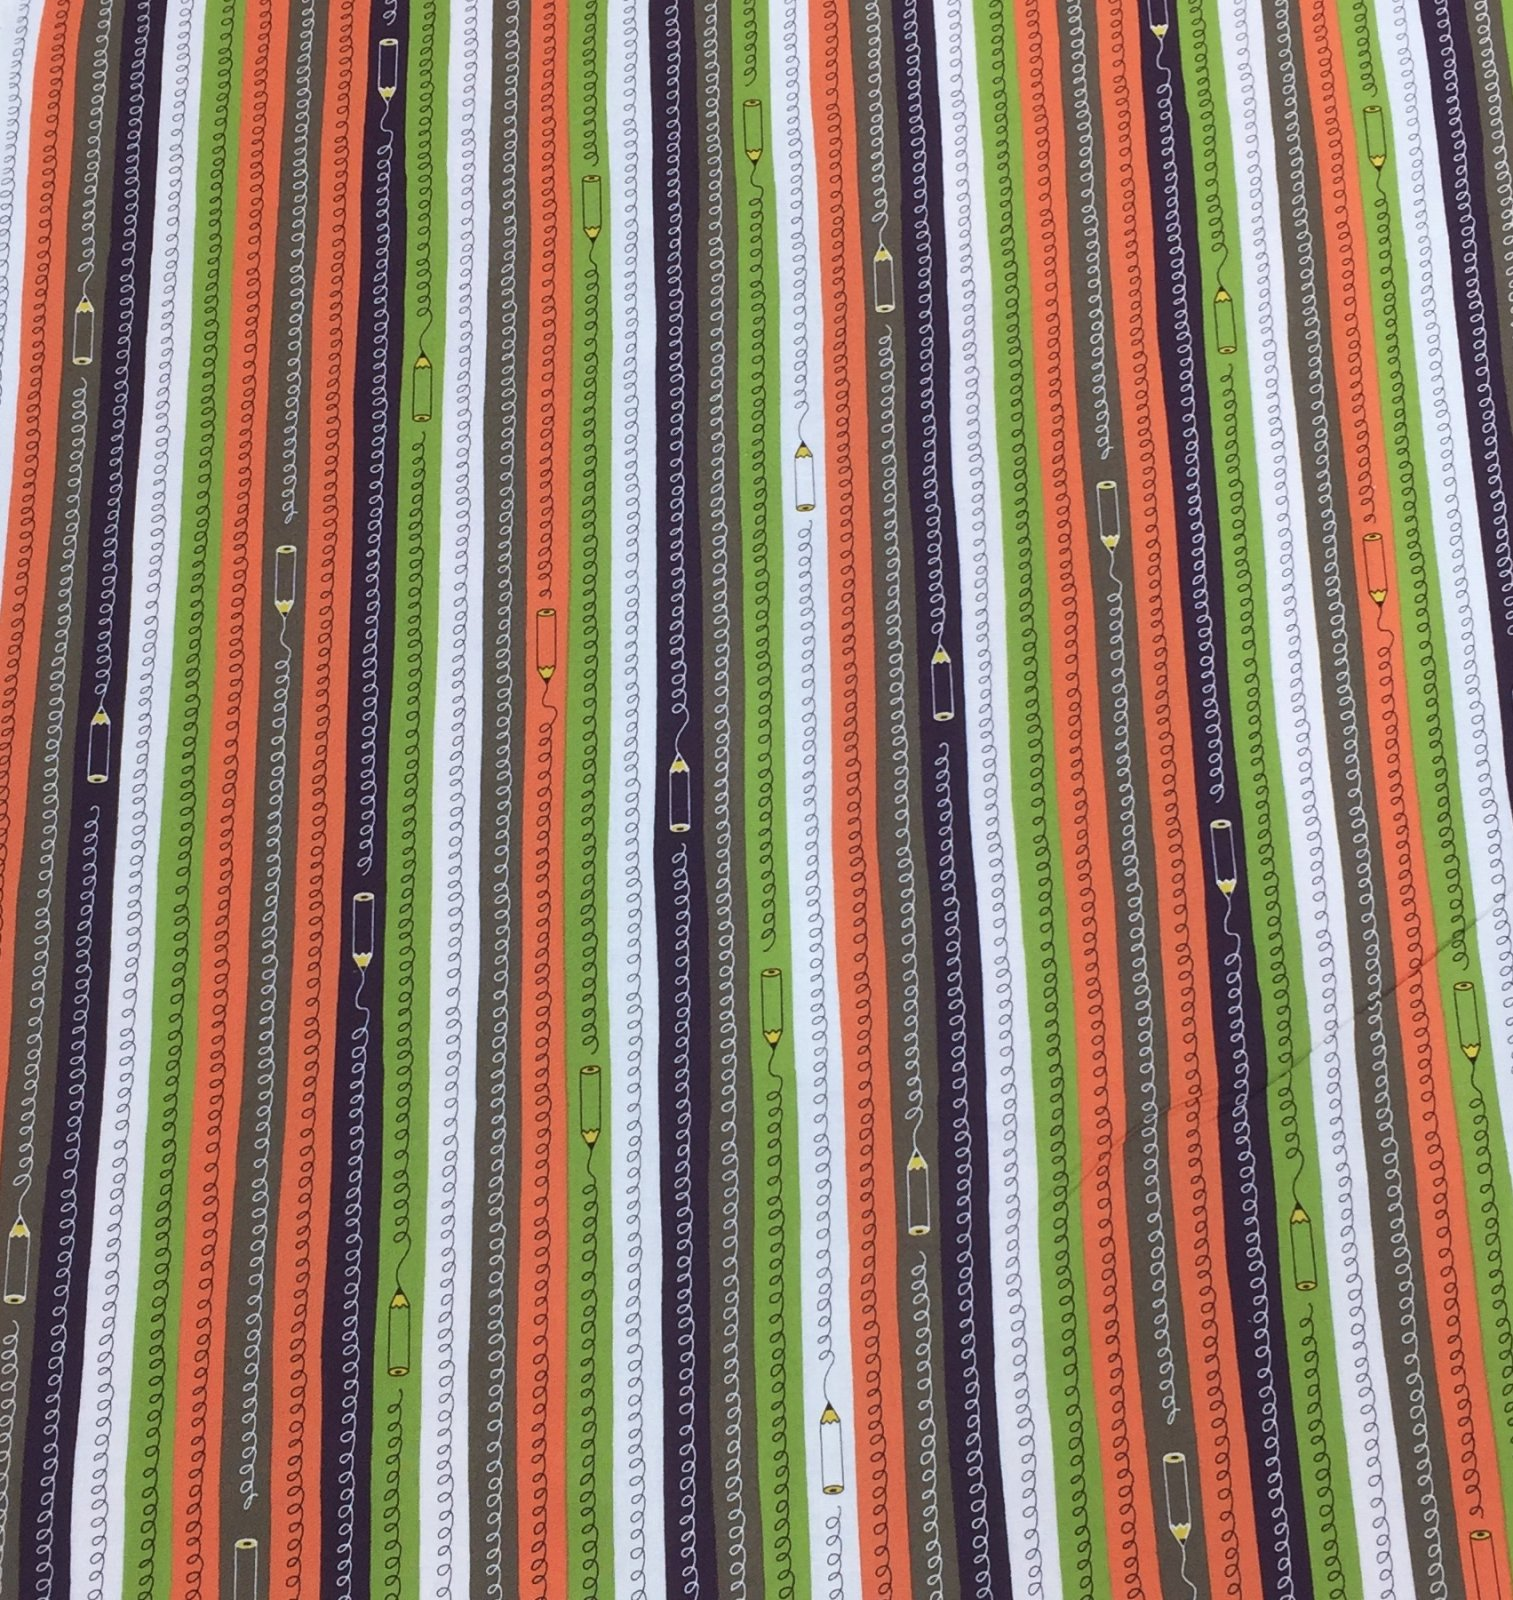 Cosmo Textiles - Pencil Stripes - Orange/Green/Brown